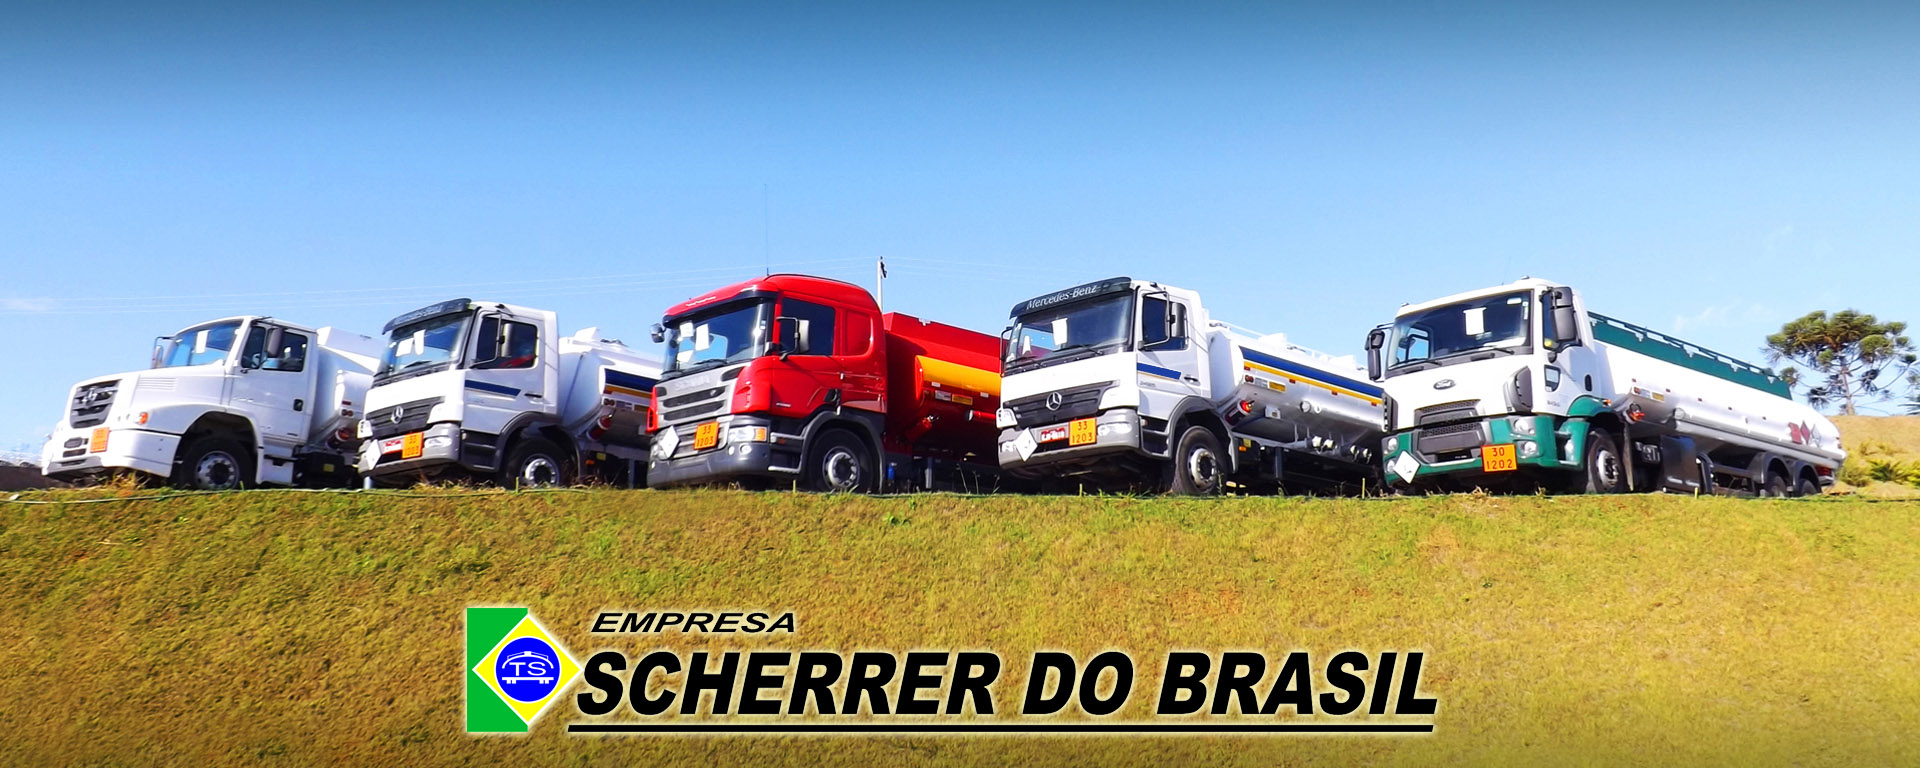 destaque_empresa_01